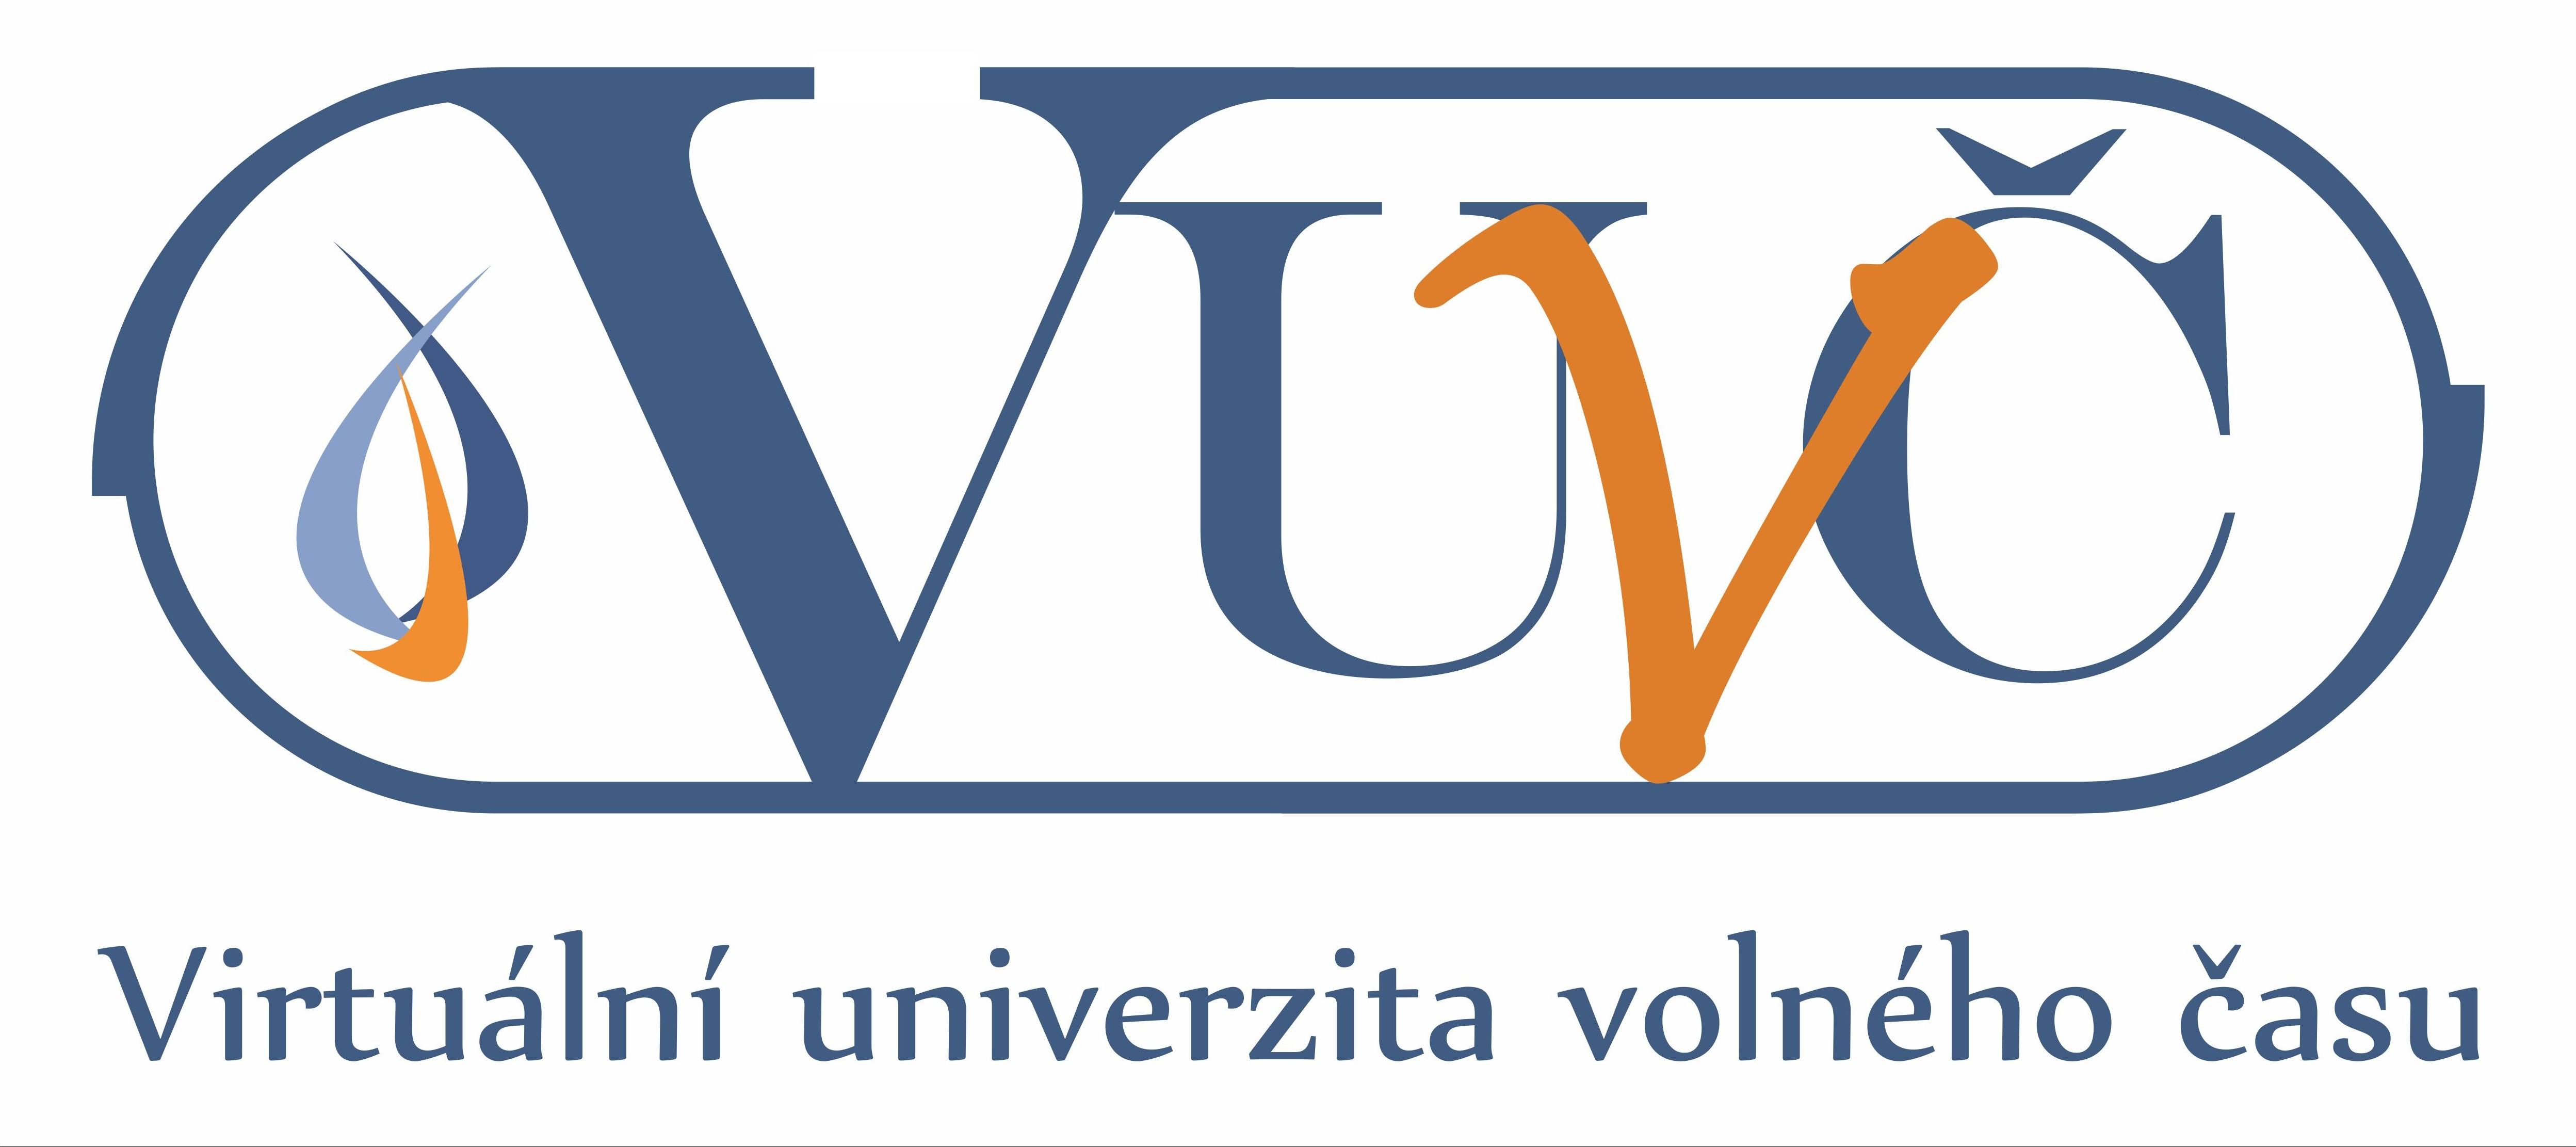 VUVČ - Virtuální univerzita volného času